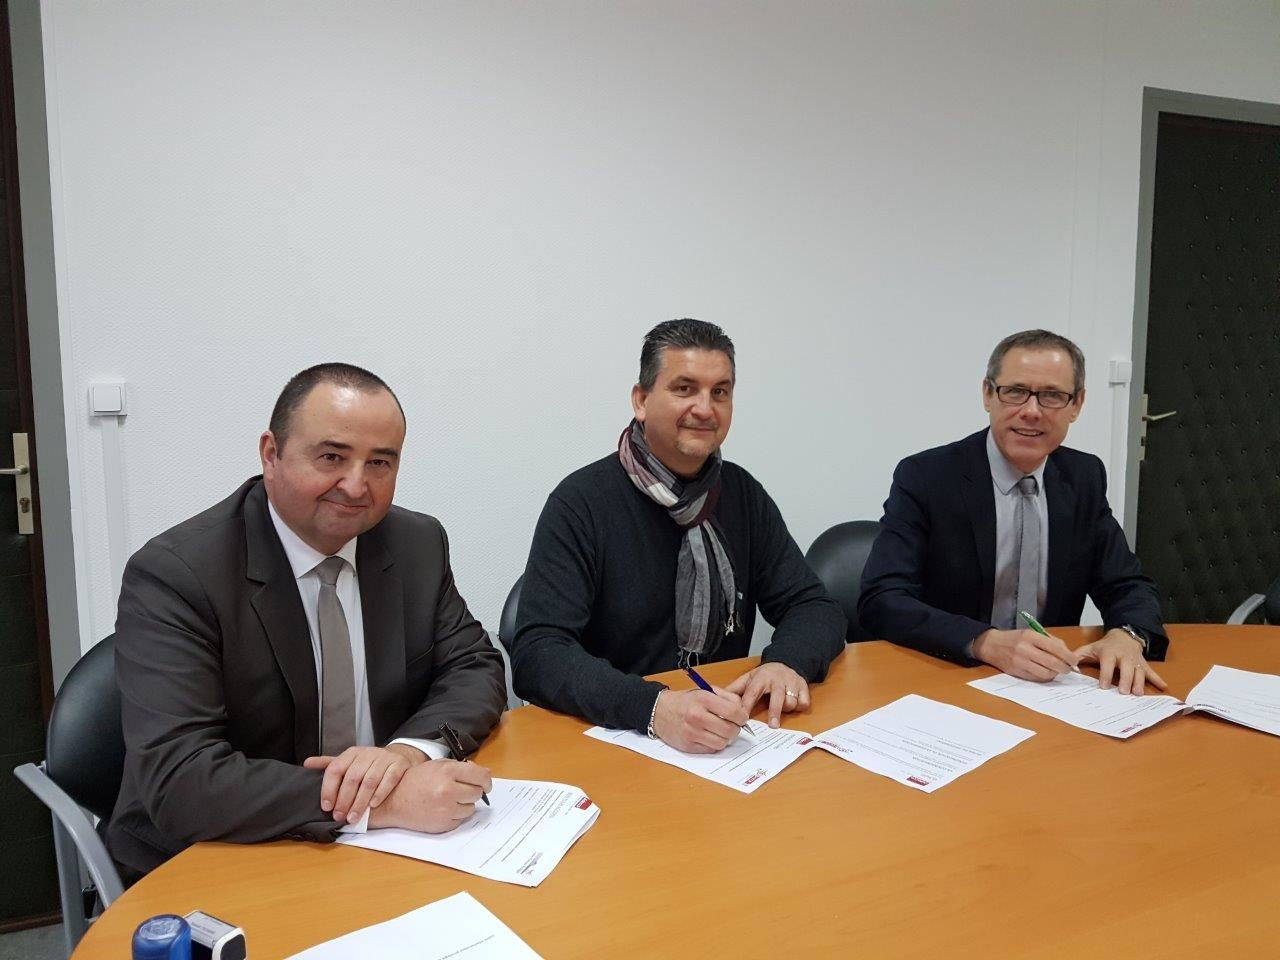 Signature de conventions entre le lycée Arago, le Greta de la Marne et Adecco